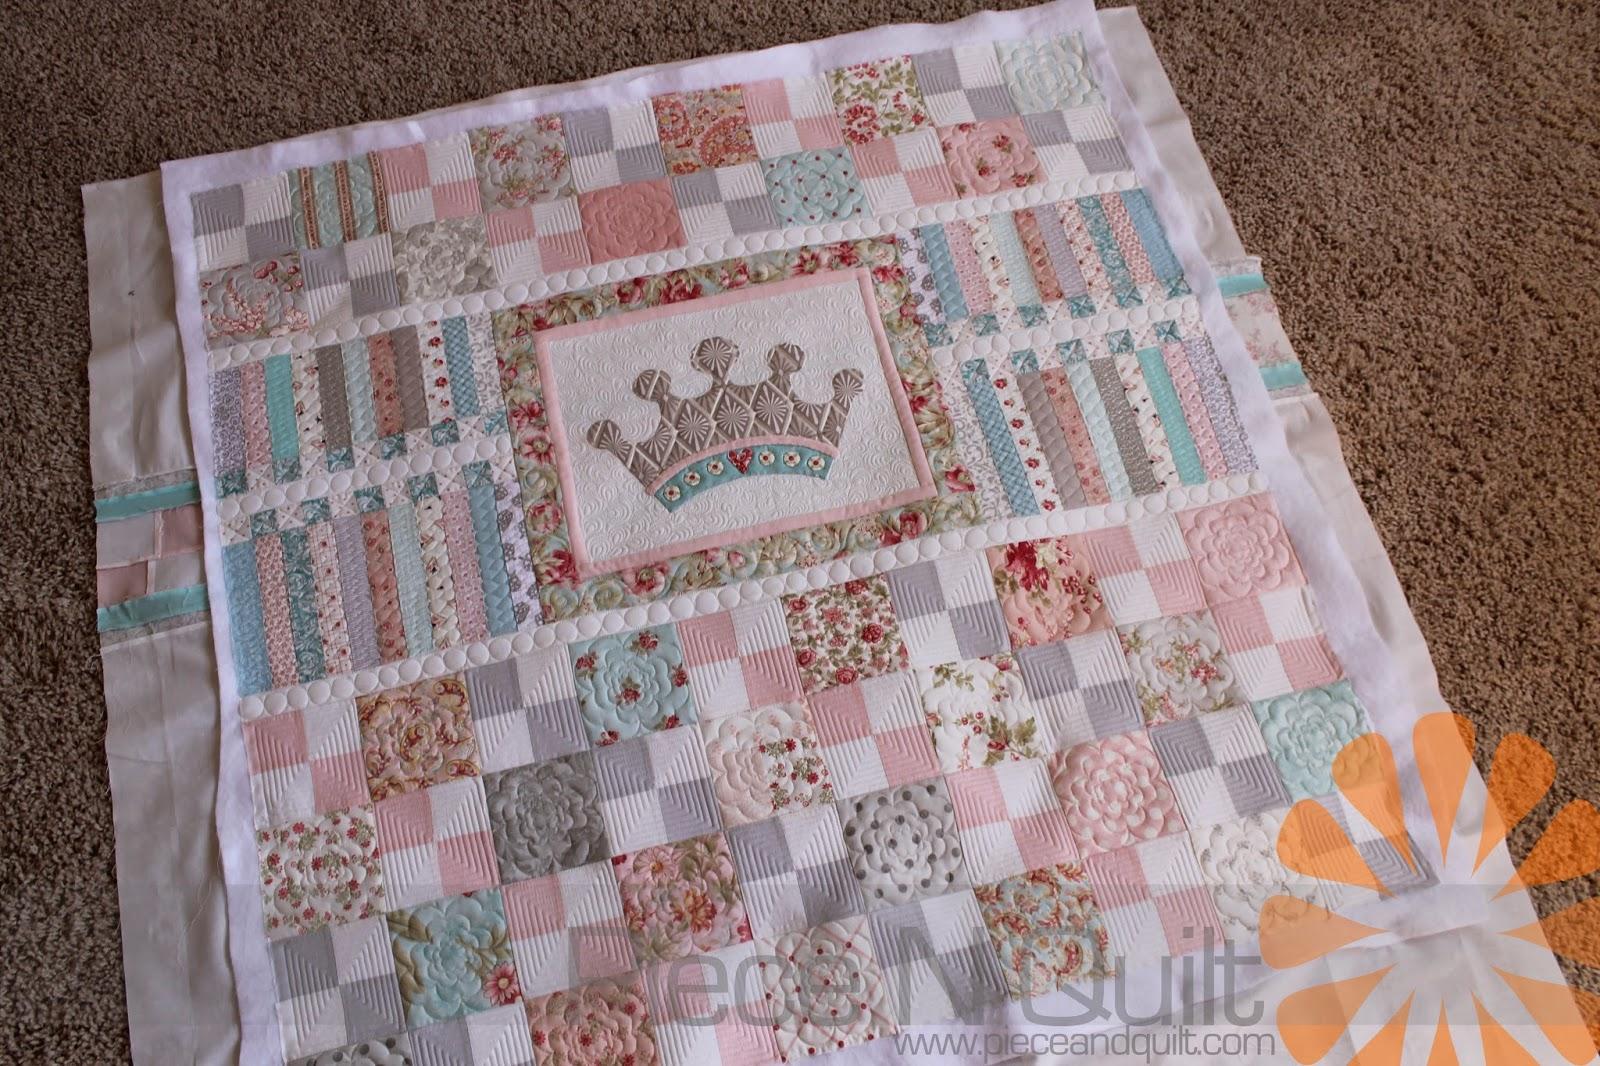 piece n quilt shabby chic meets geometric quilting custom machine rh pieceandquilt com shabby chic baby rag quilt